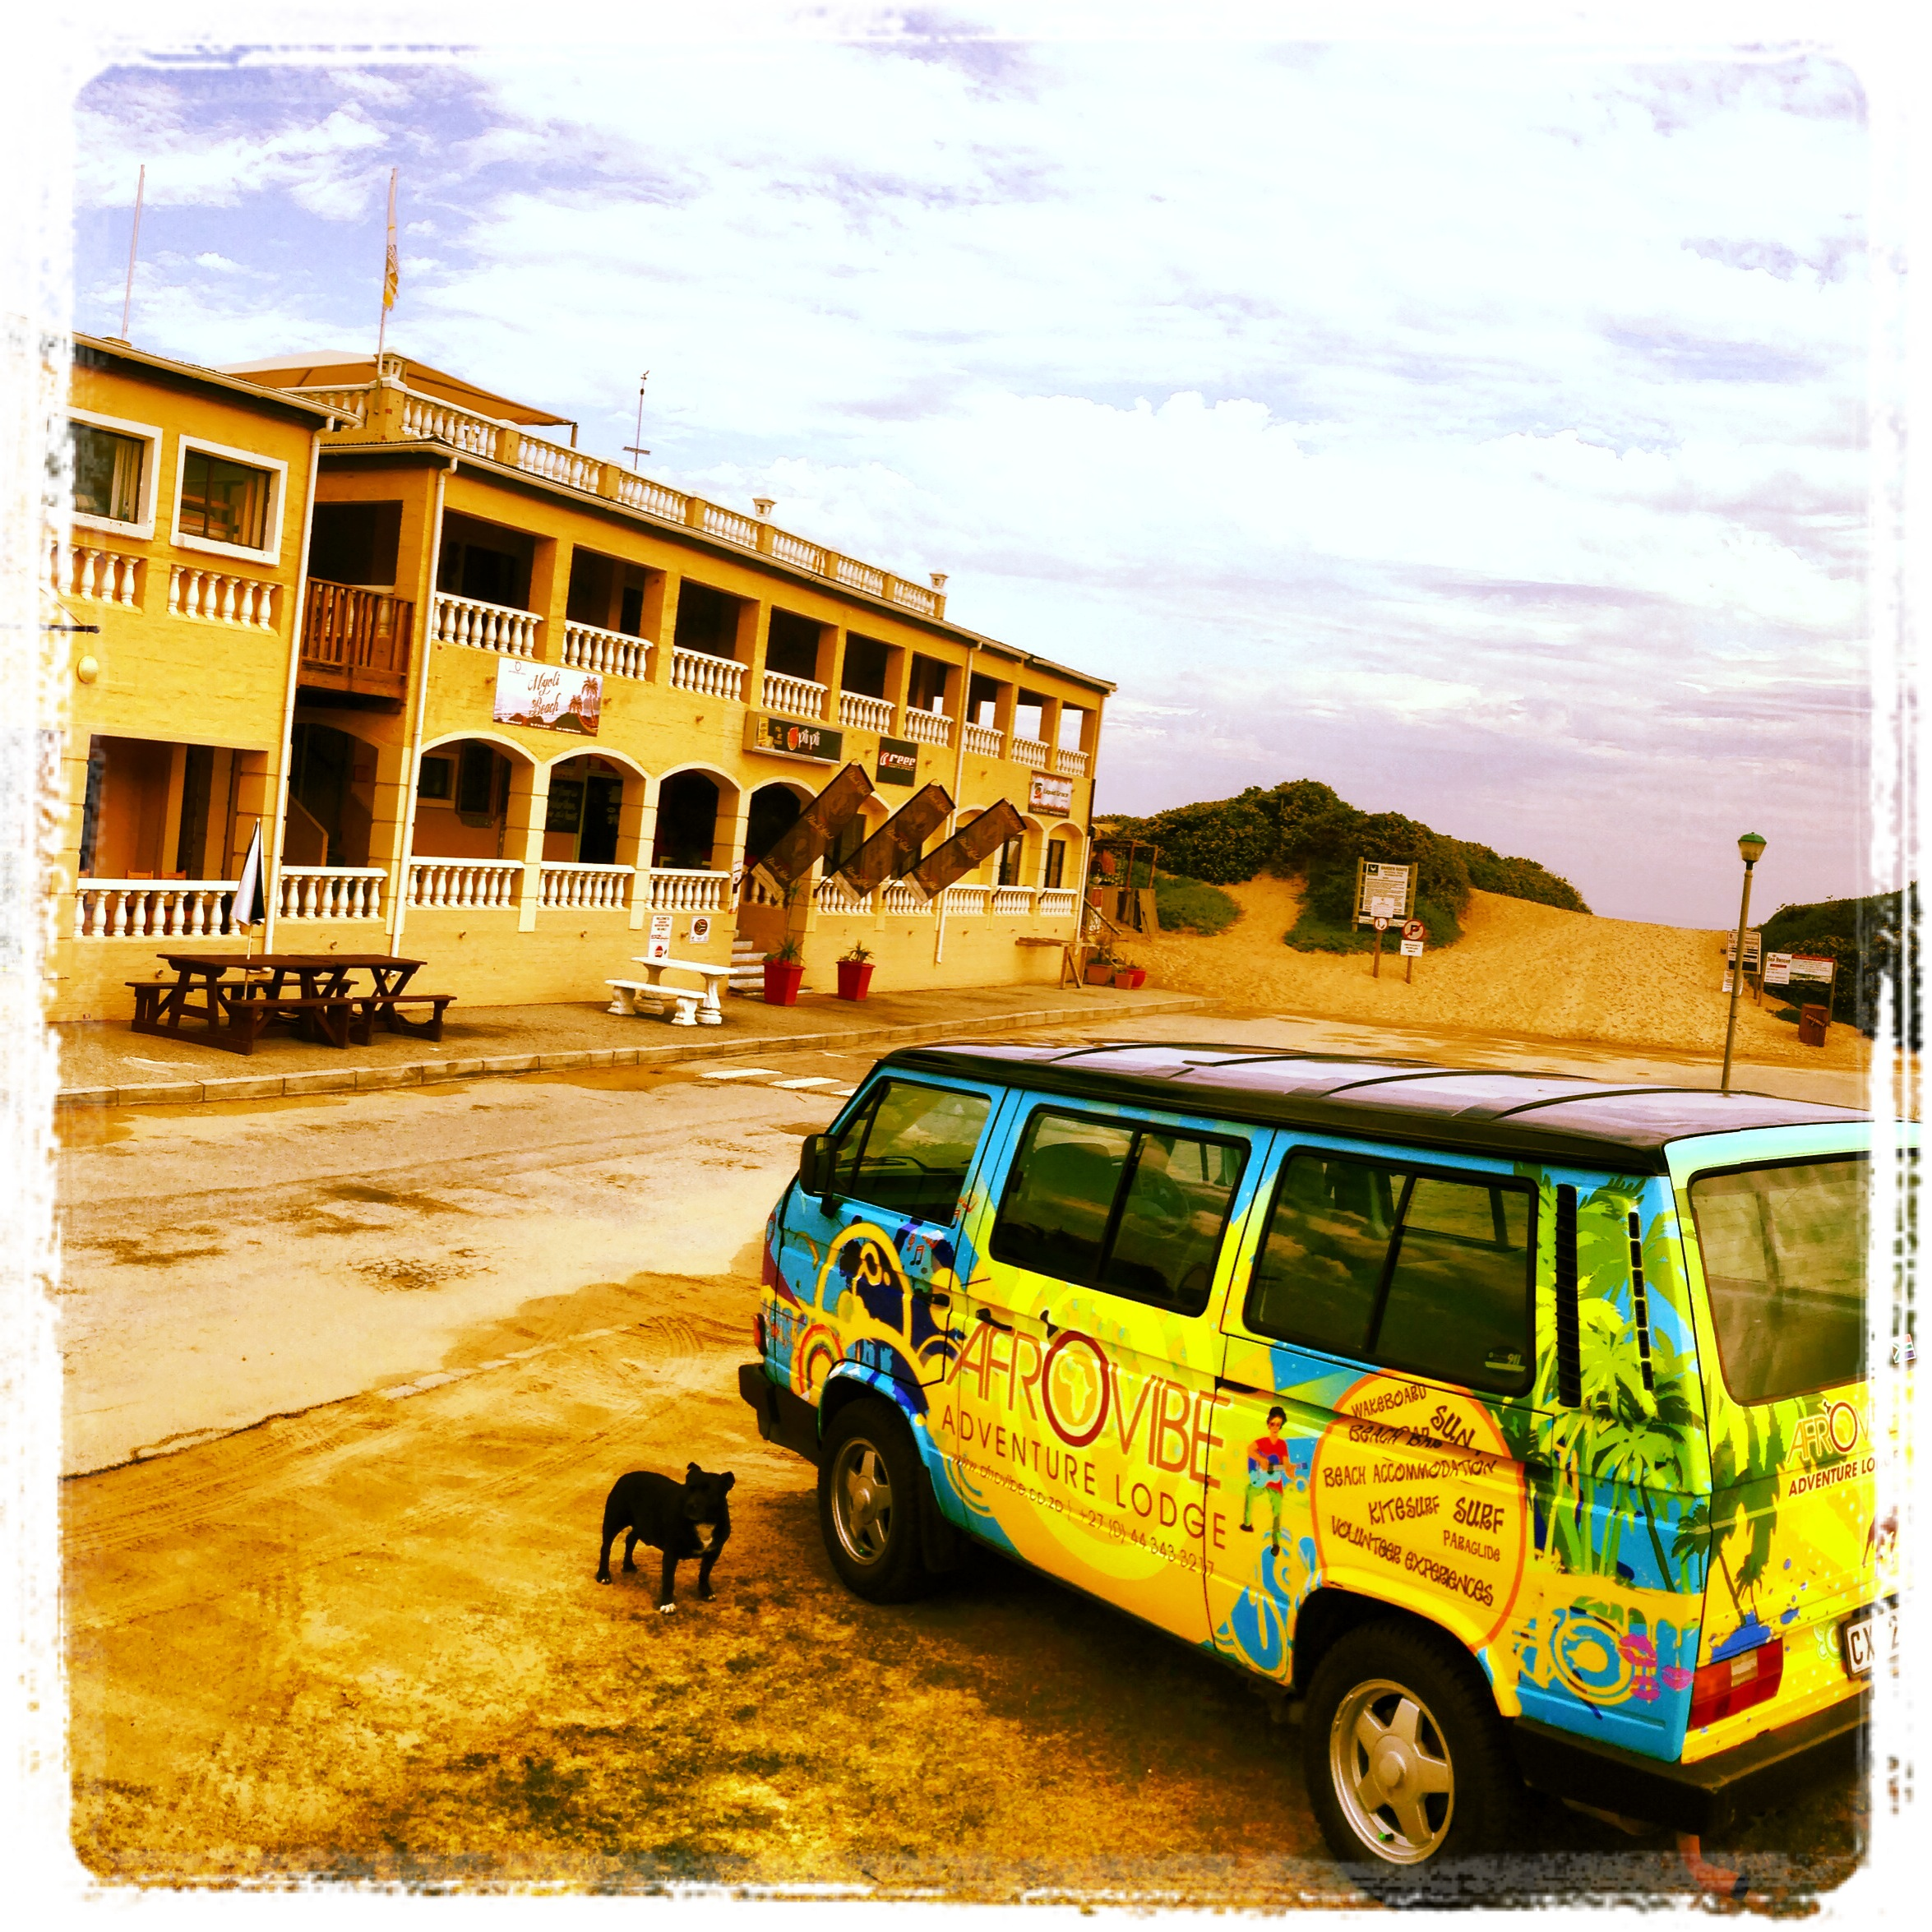 Afrovibe Adventure Lodge